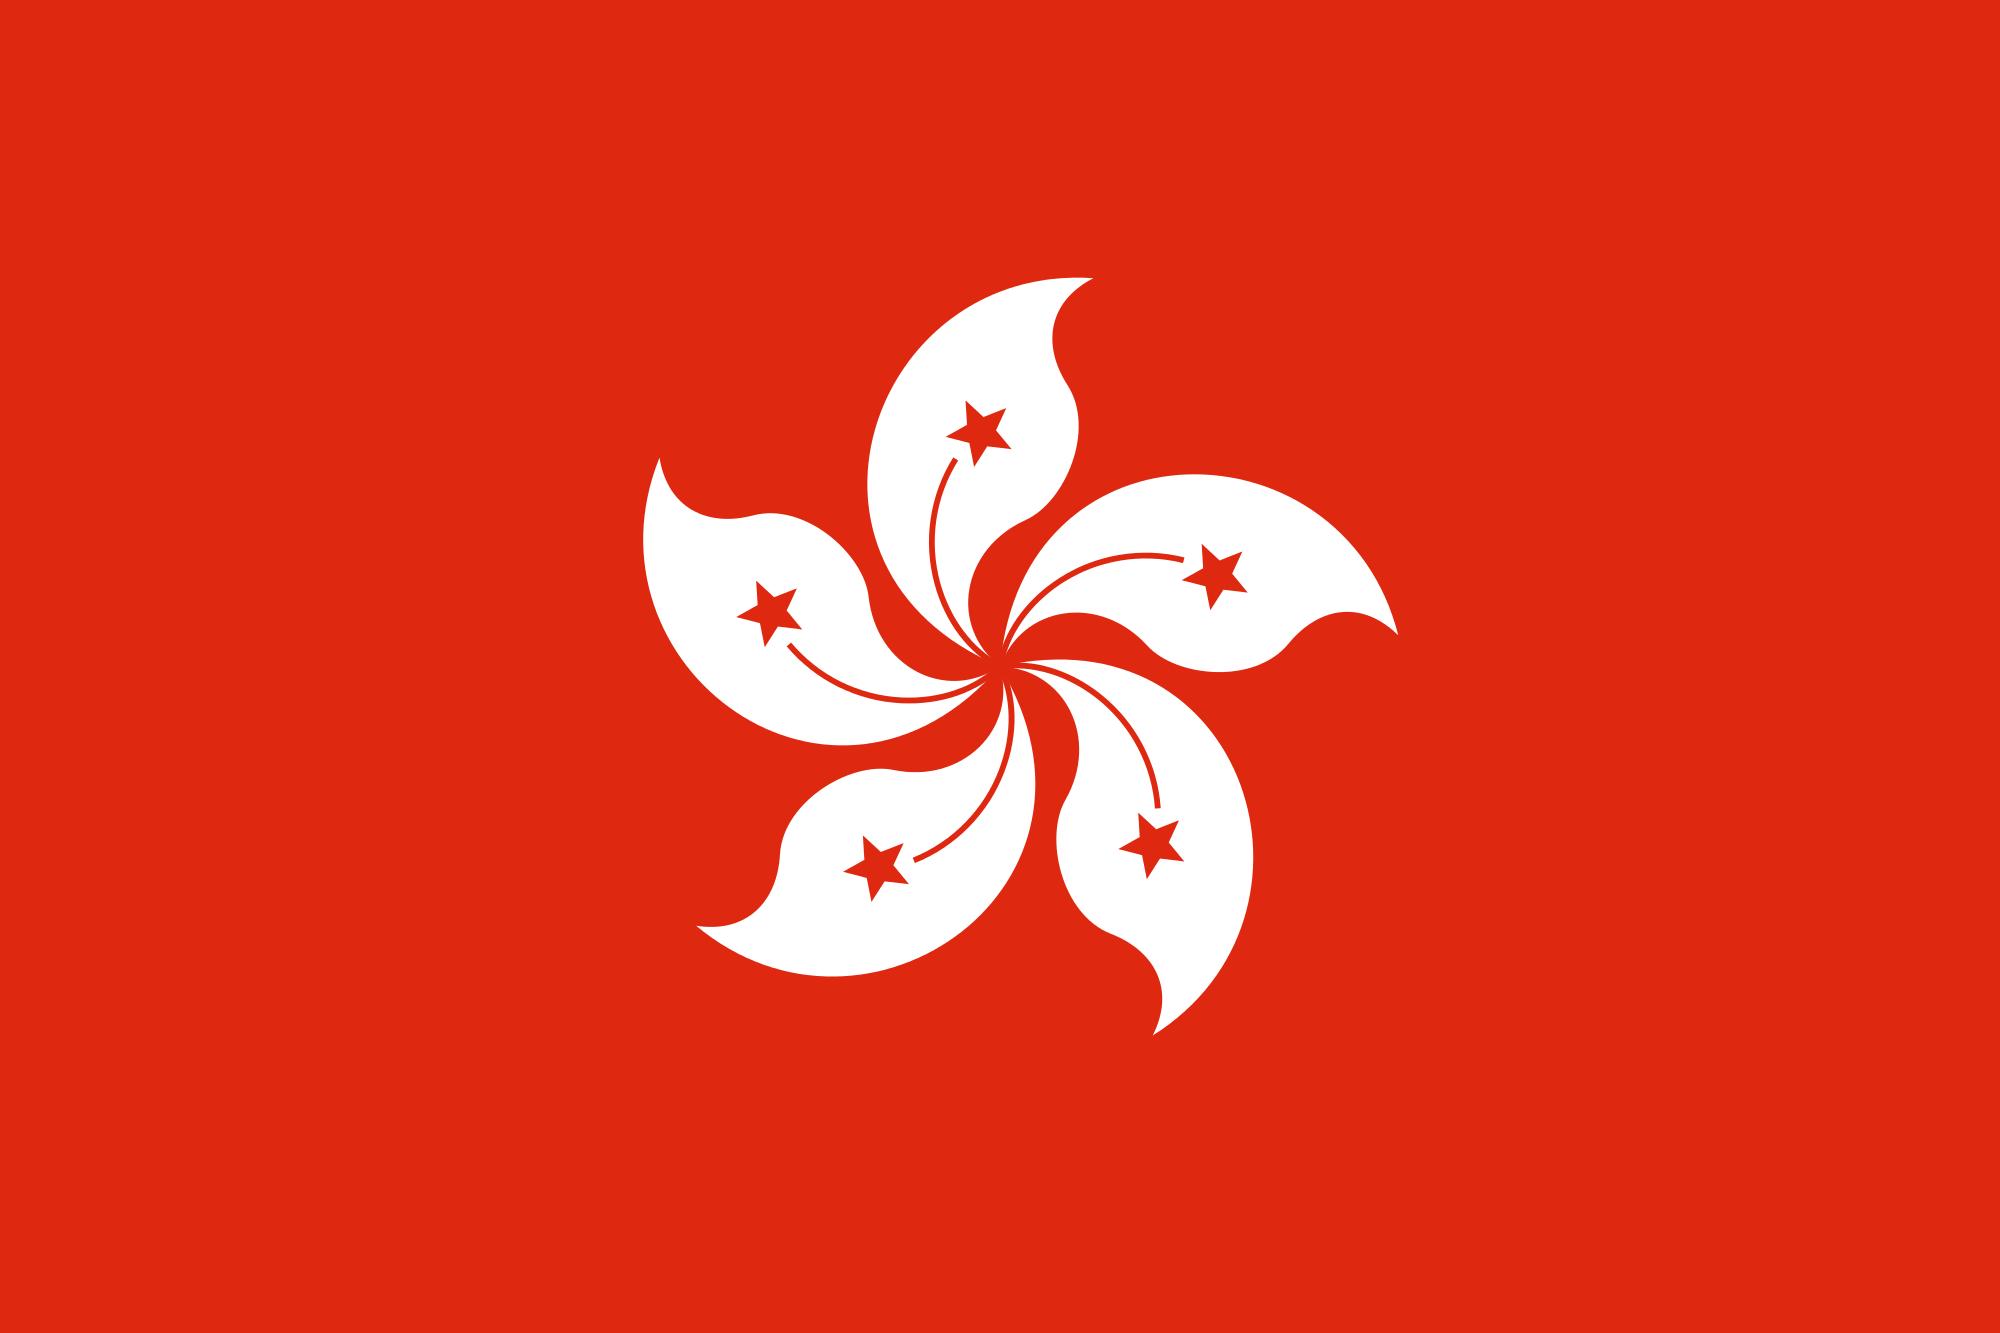 hong kong, país, emblema, insignia, символ - Обои HD - Профессор falken.com